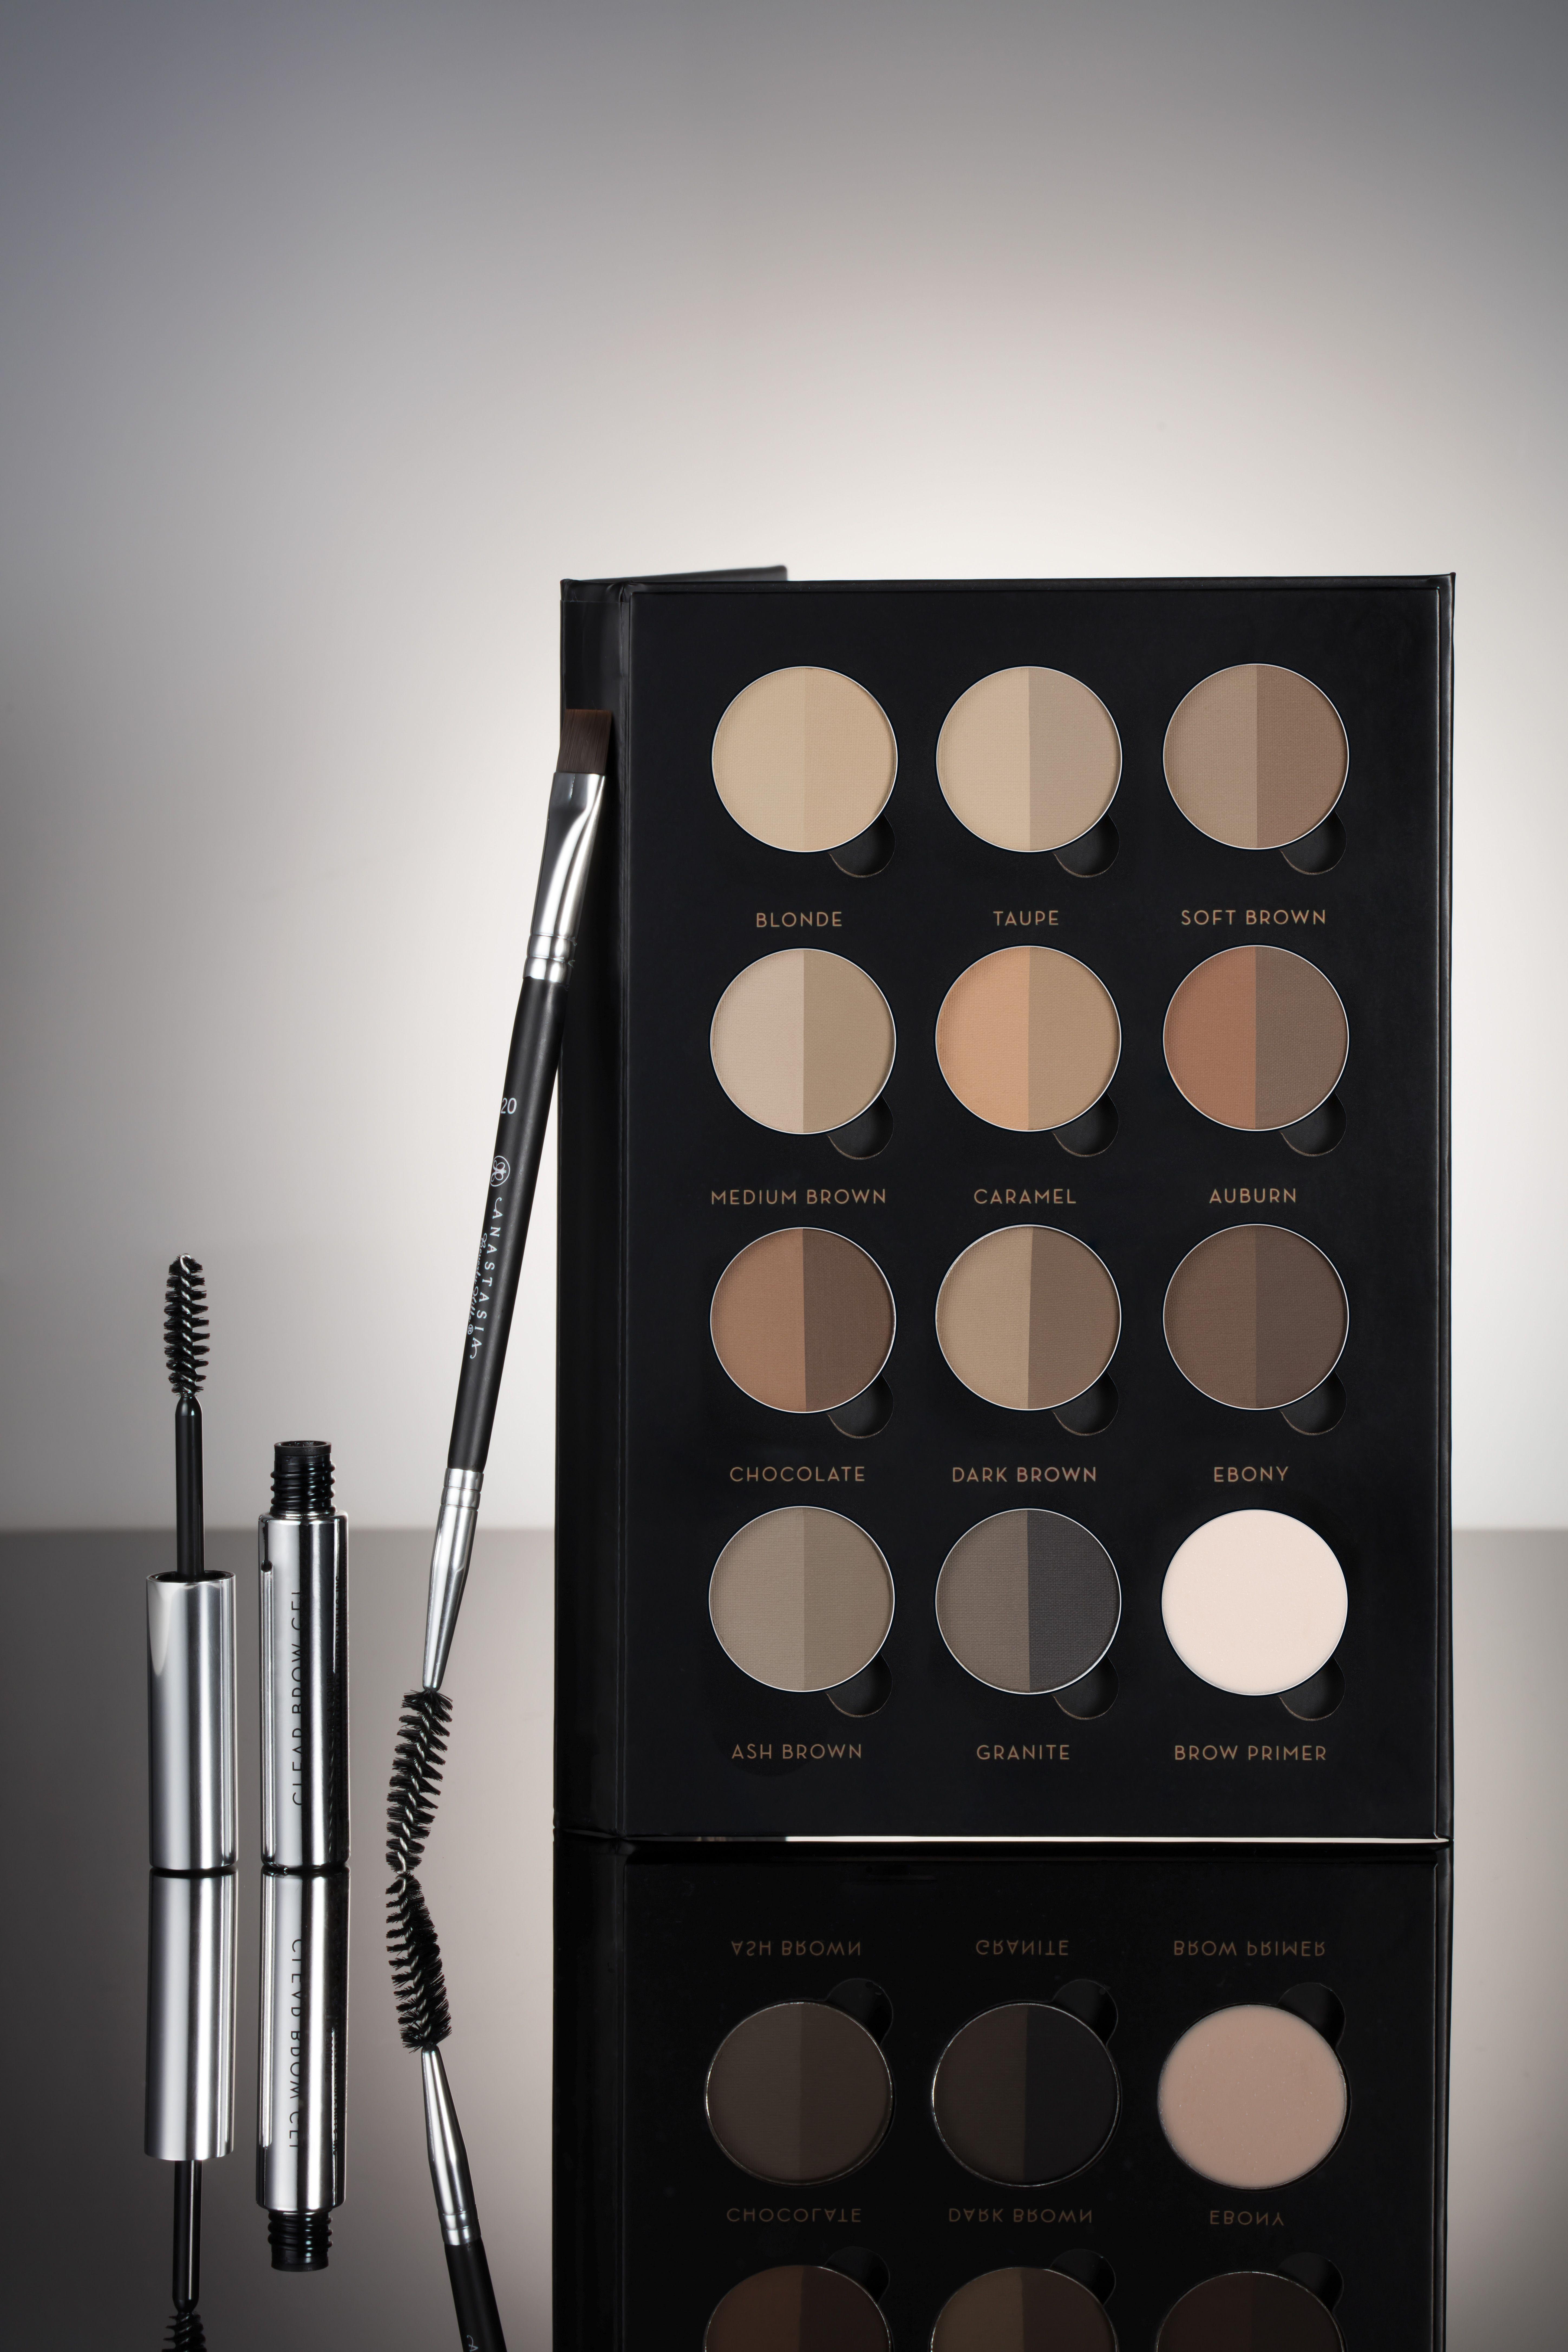 Brow Pro Palette Eyebrow Powder, Primer Makeup